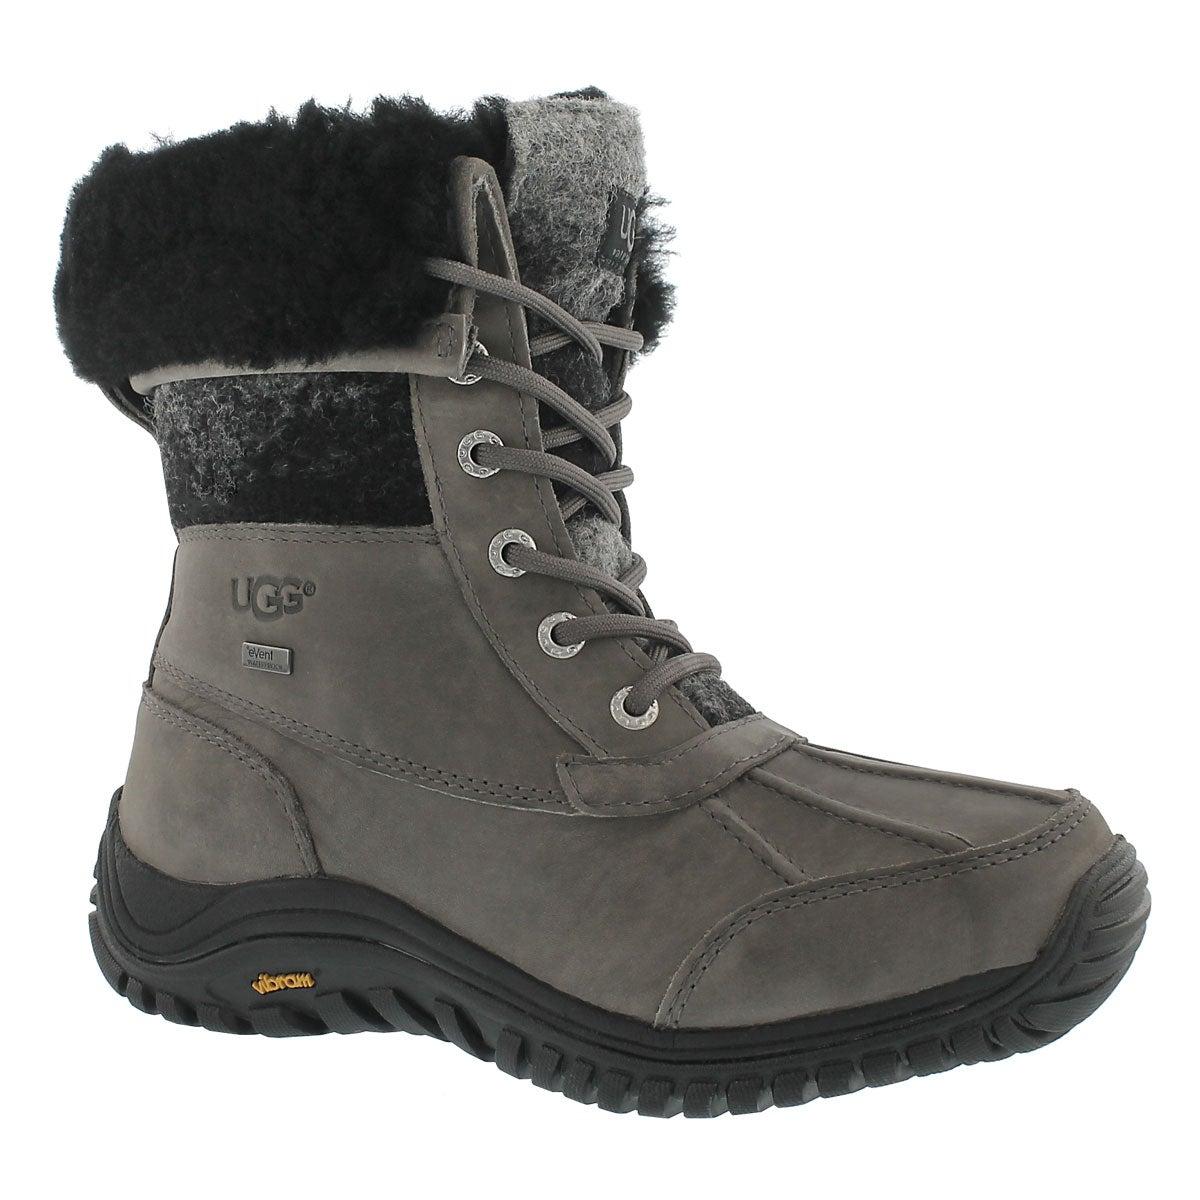 Lds Adirondack II charcoal winter boot